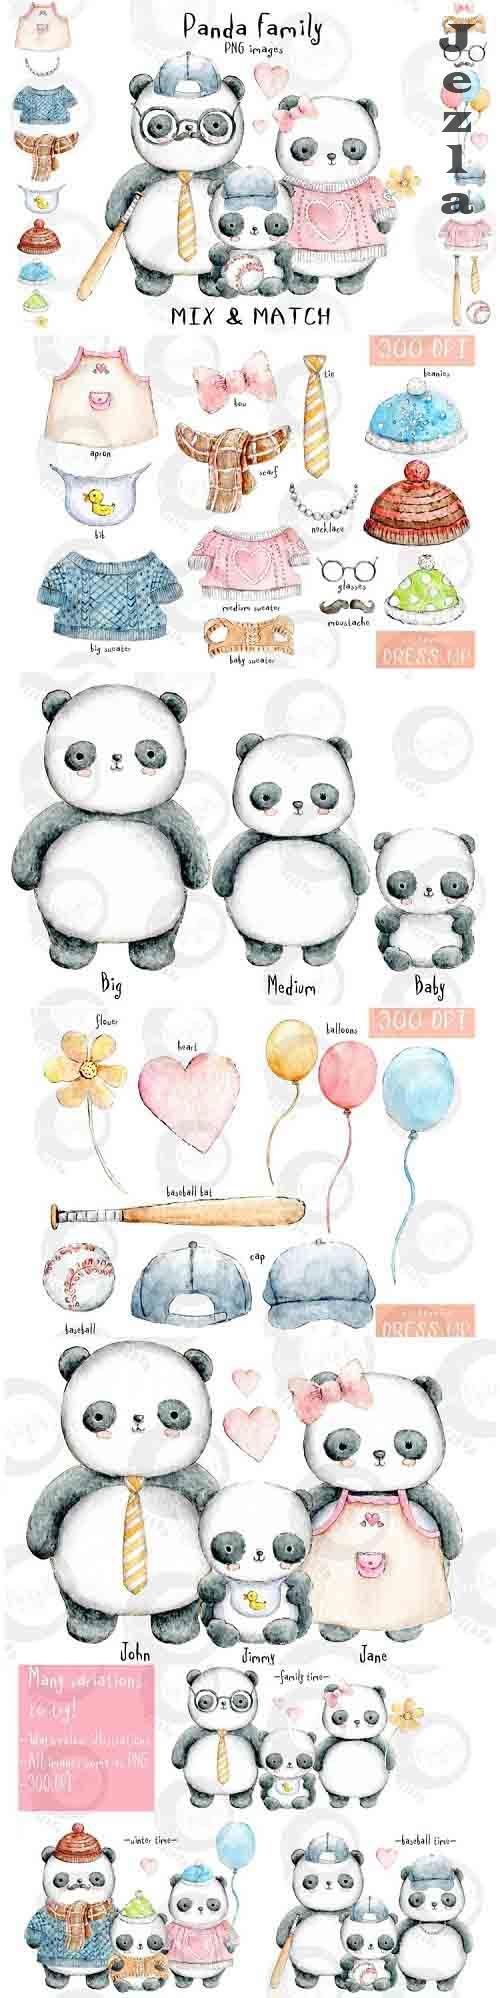 Panda Family | Mix & Match | PNG Watercolour Illustrations - 1034418